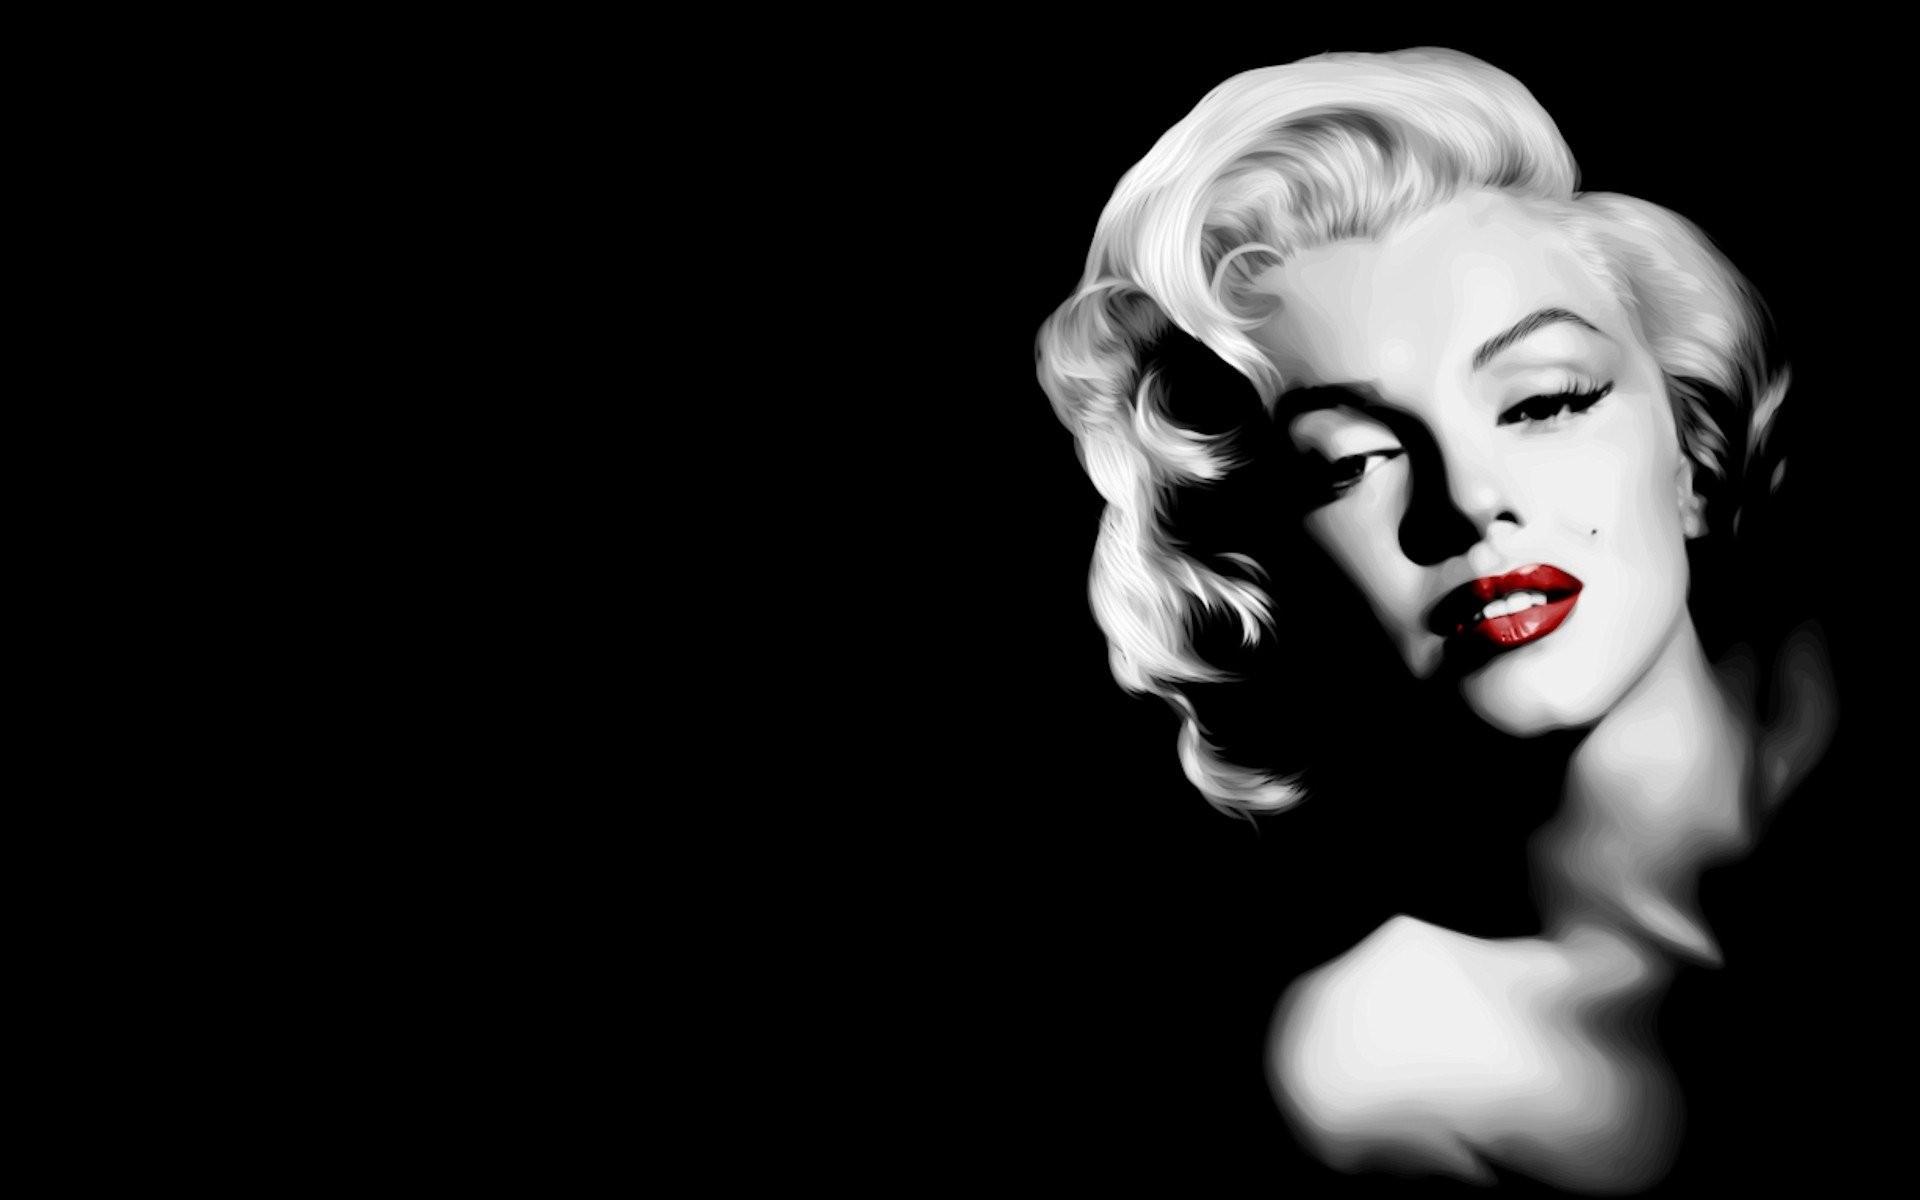 Marilyn Monroe Wallpaper Download Free Amazing Wallpapers Of